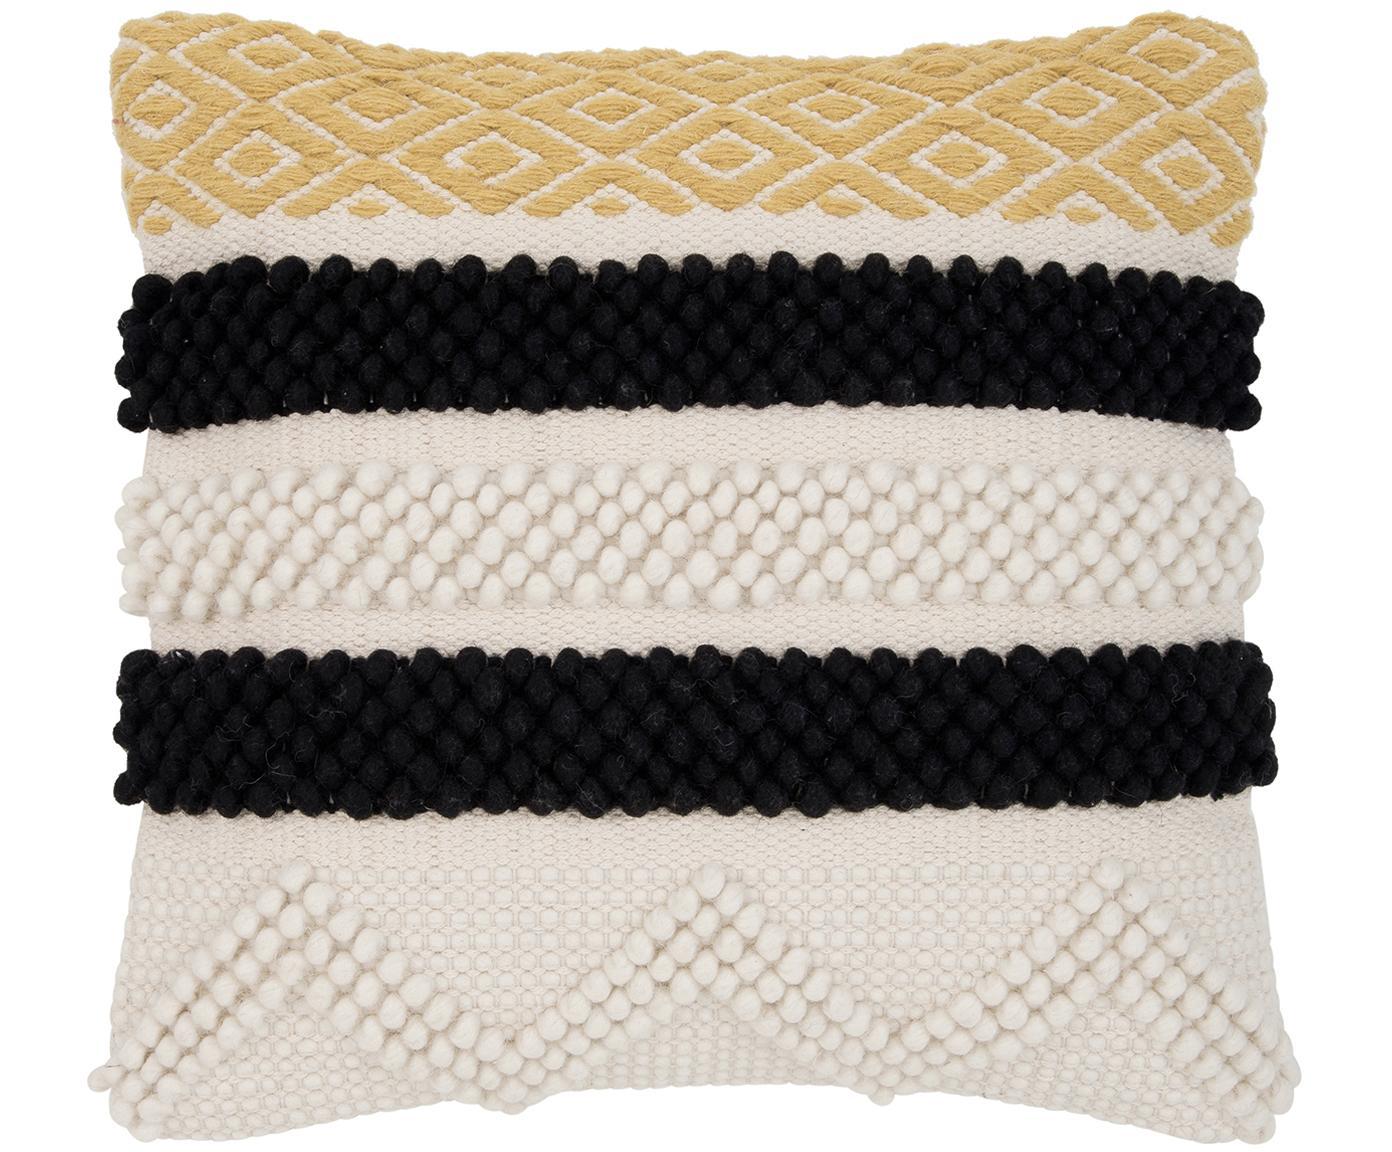 Funda de cojín Takala, estilo boho, 80%algodón, 20%poliéster, Crudo, negro, amarillo, An 45 x L 45 cm